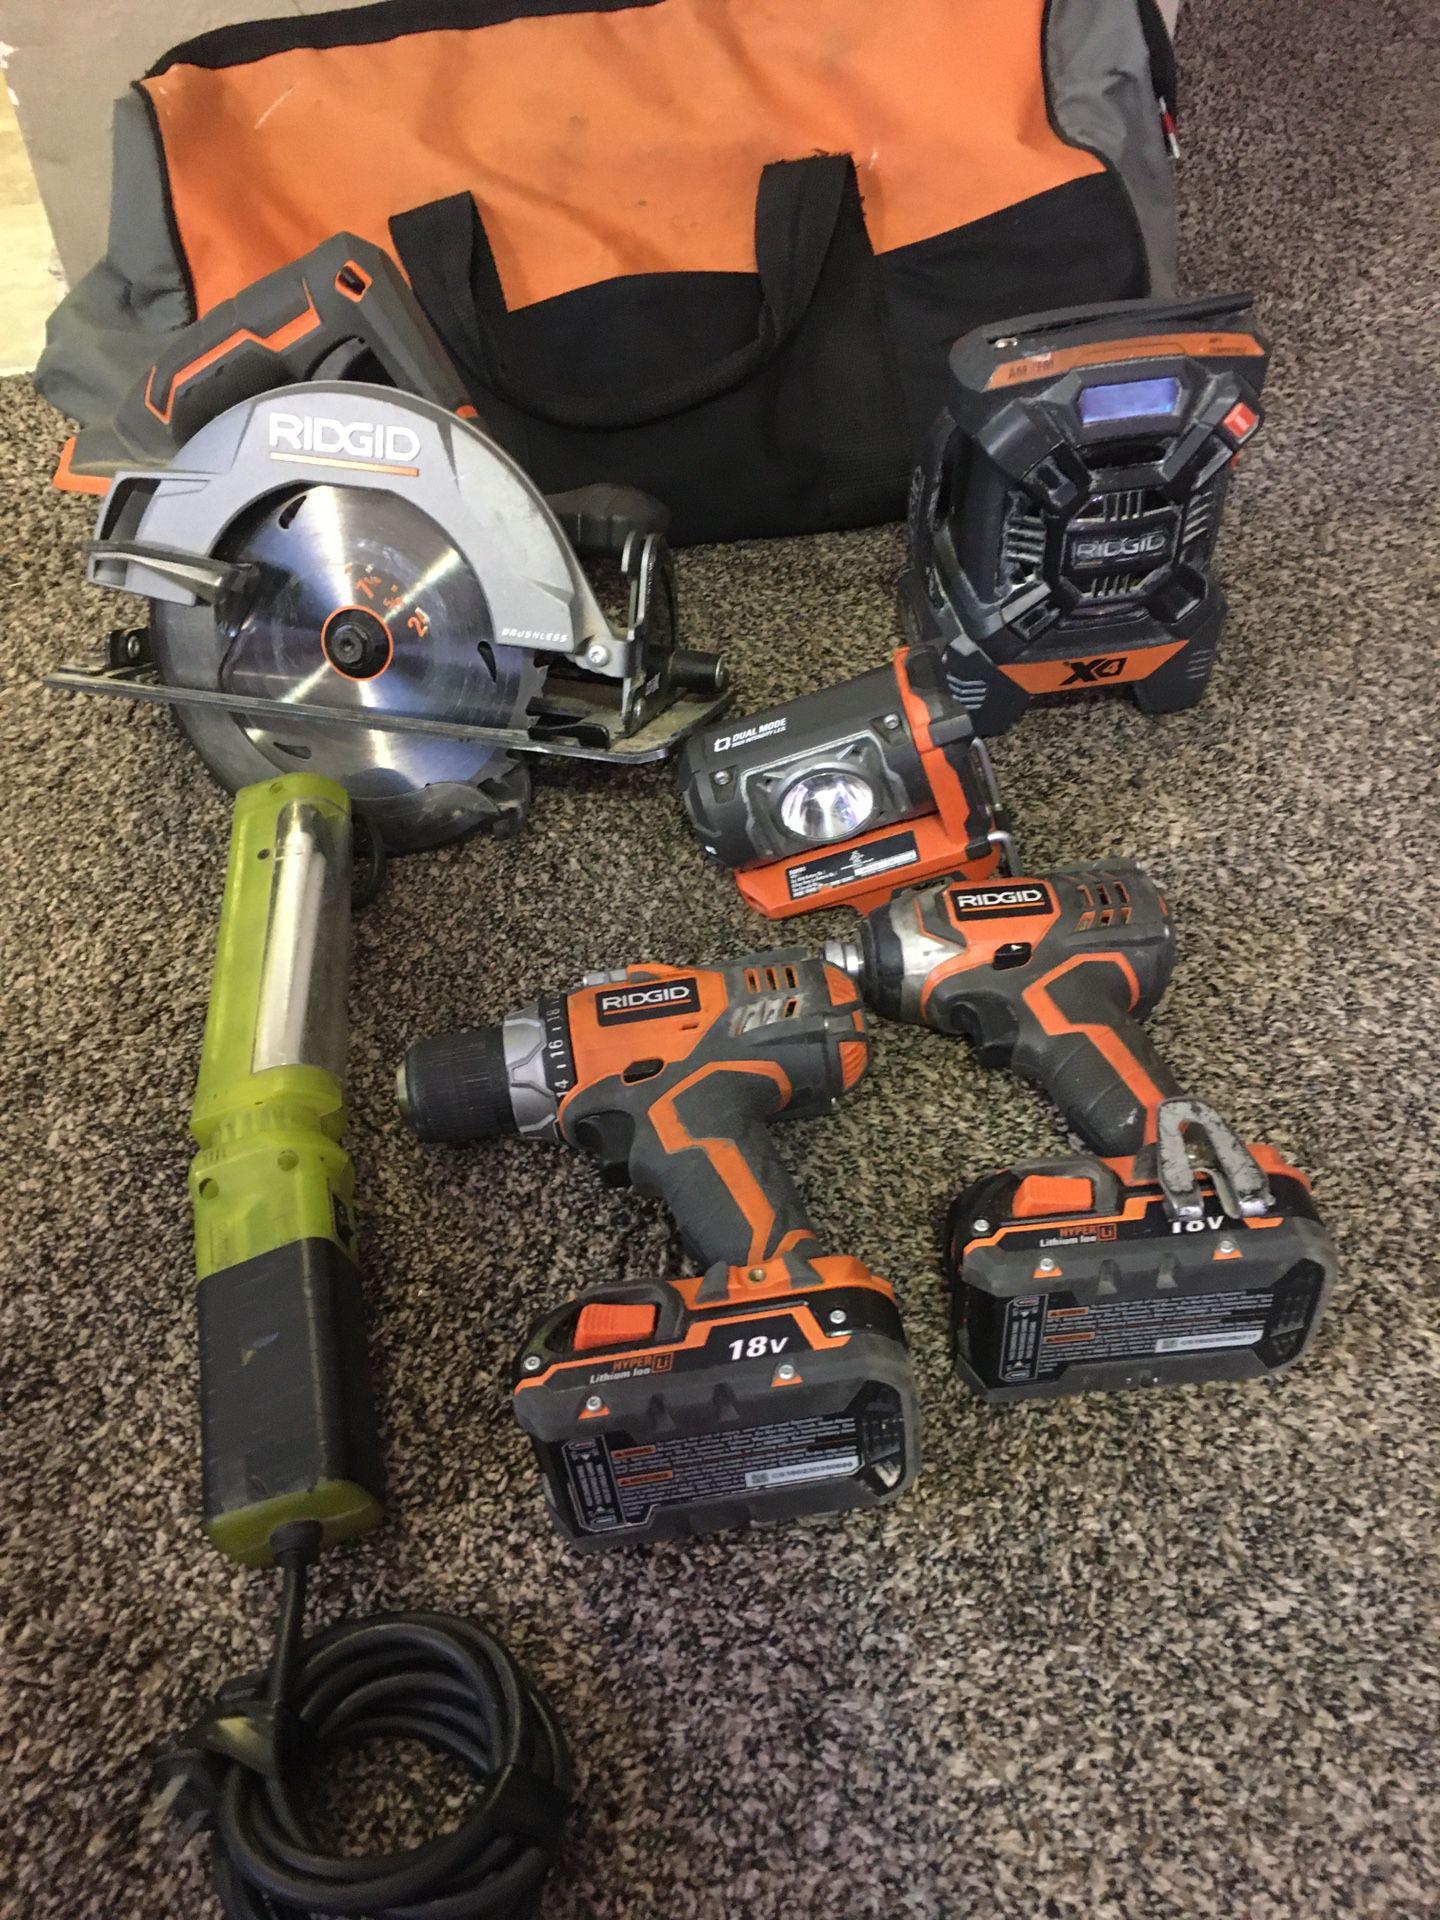 Rigid power tools